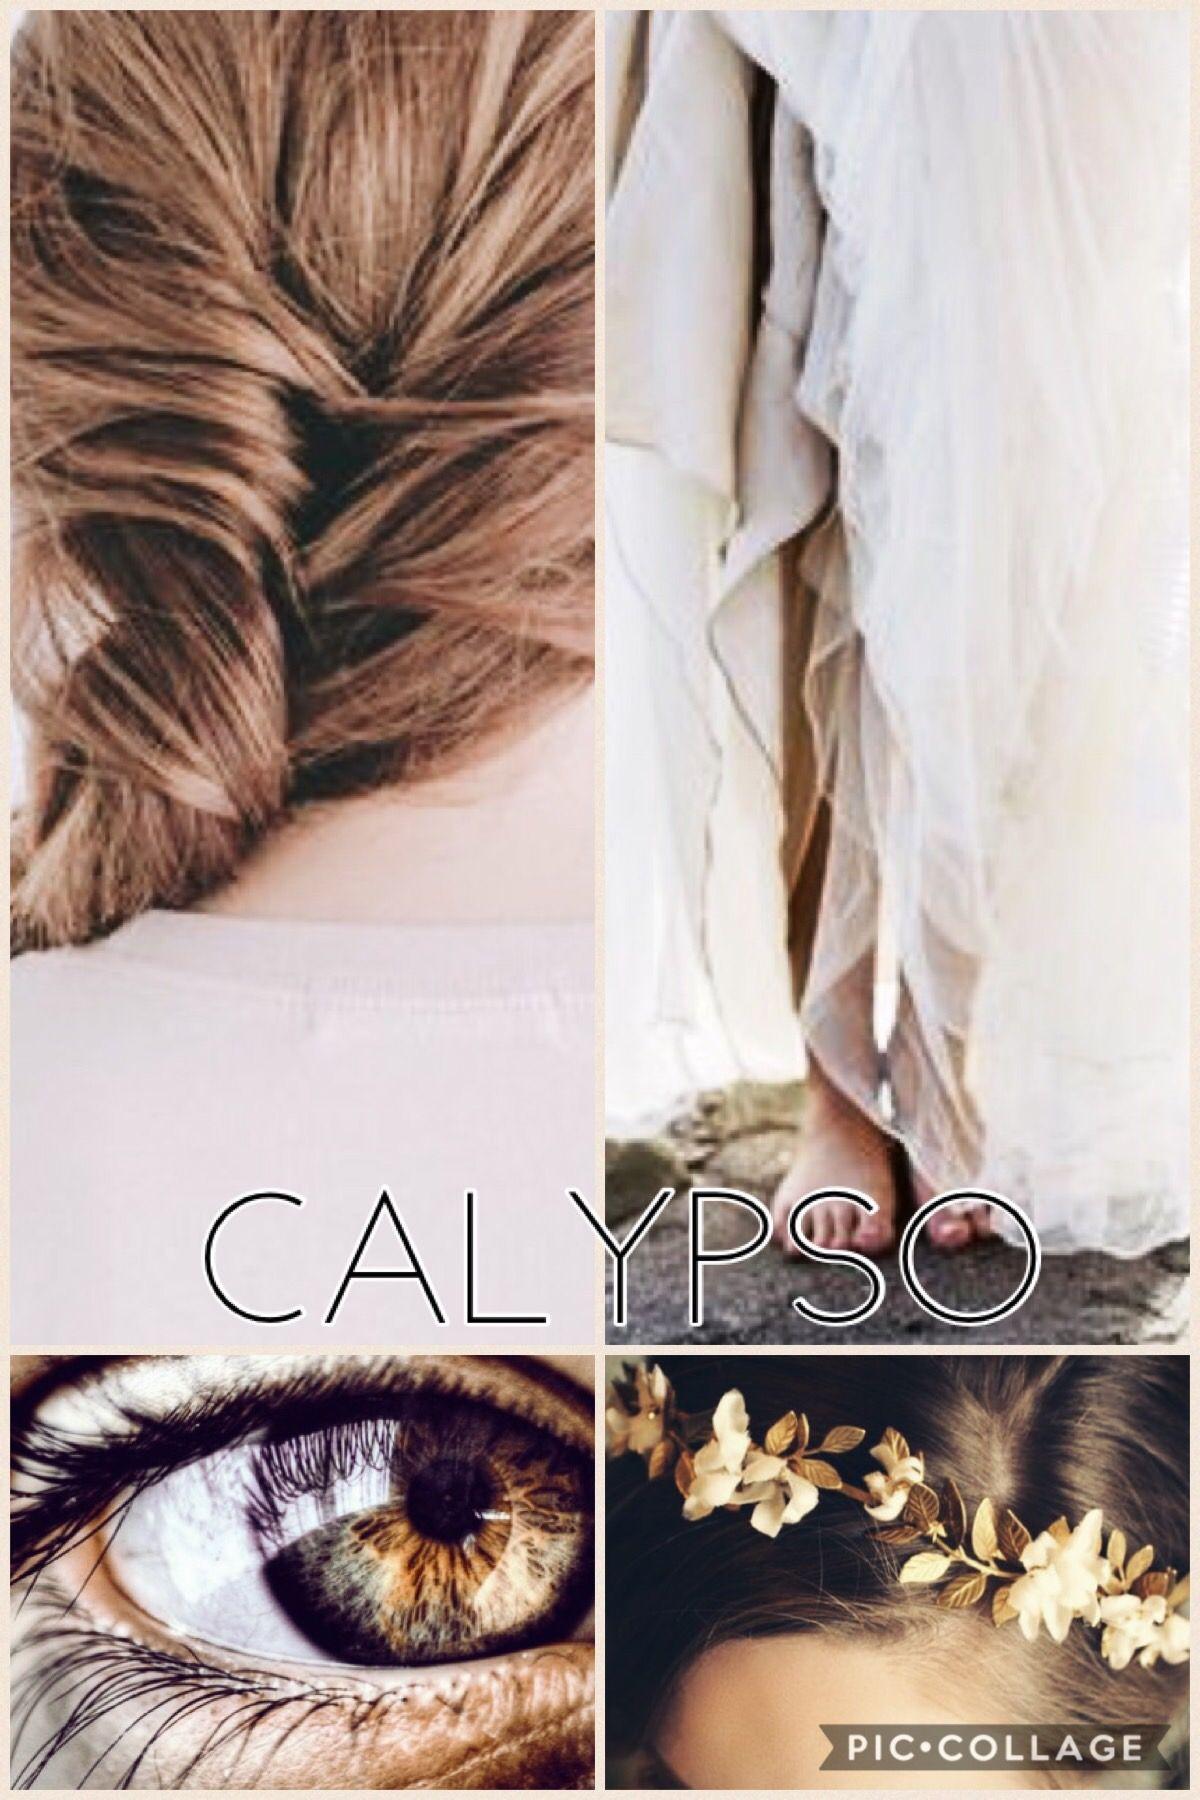 Percy Jackson Calypso Aesthetic